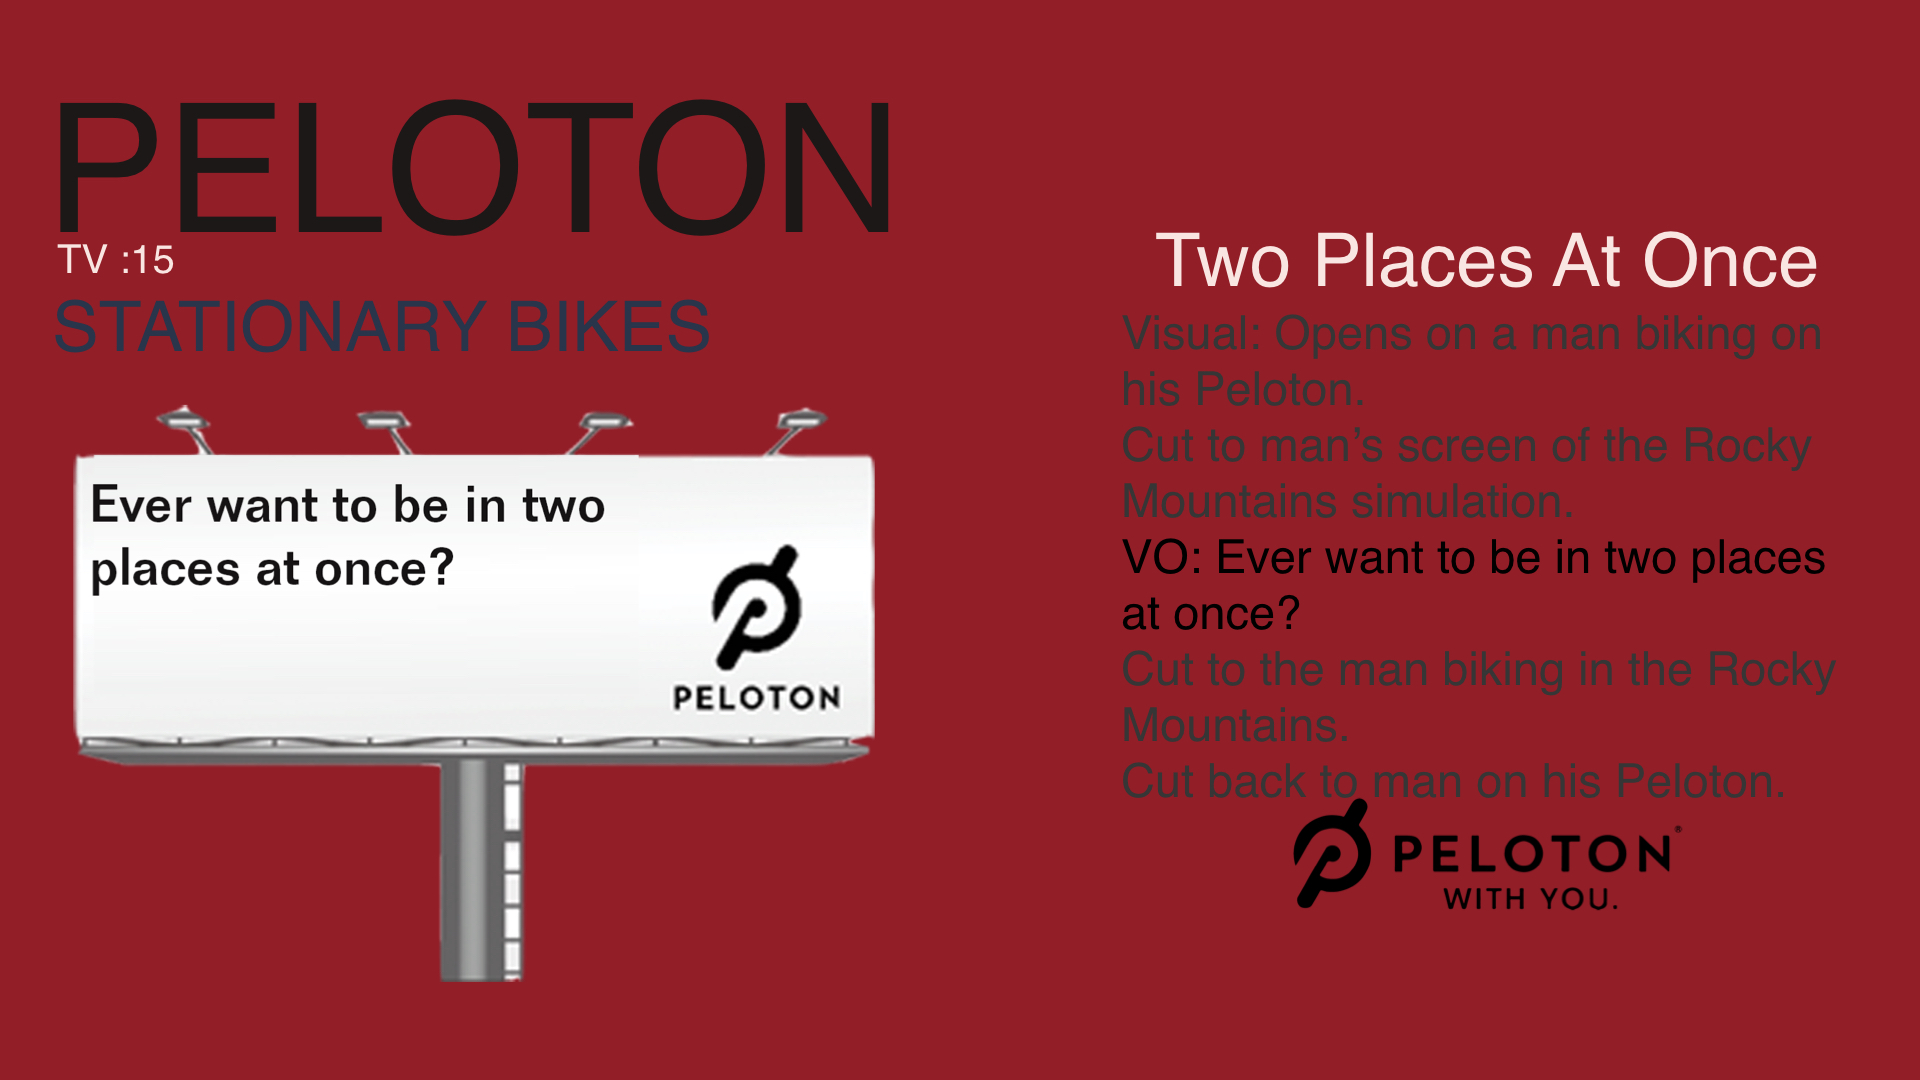 Peloton Brand Campaign Jonah.043.jpeg